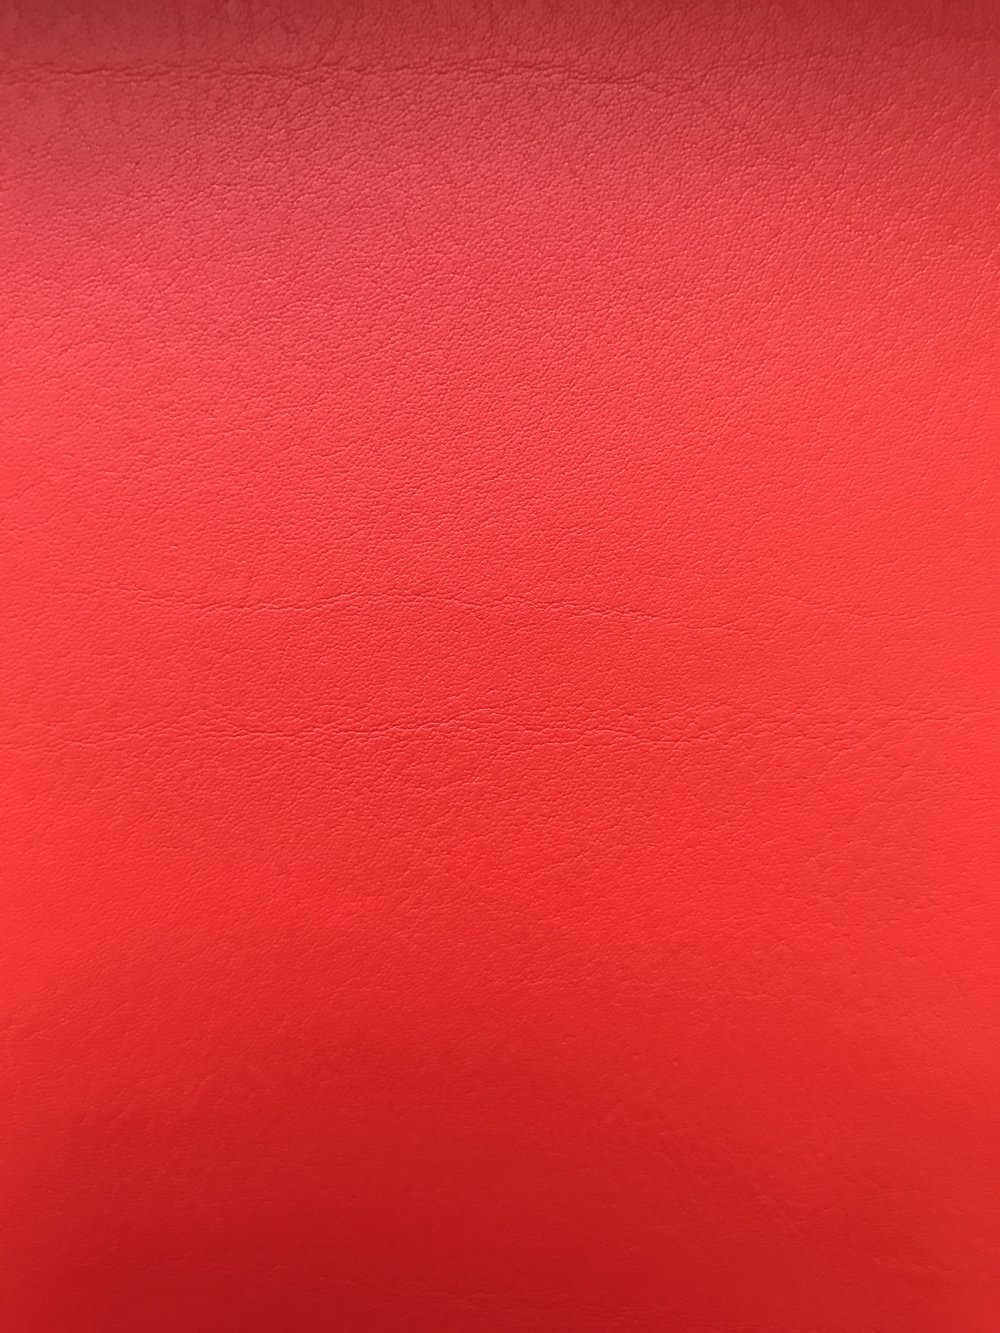 B05 Crimson